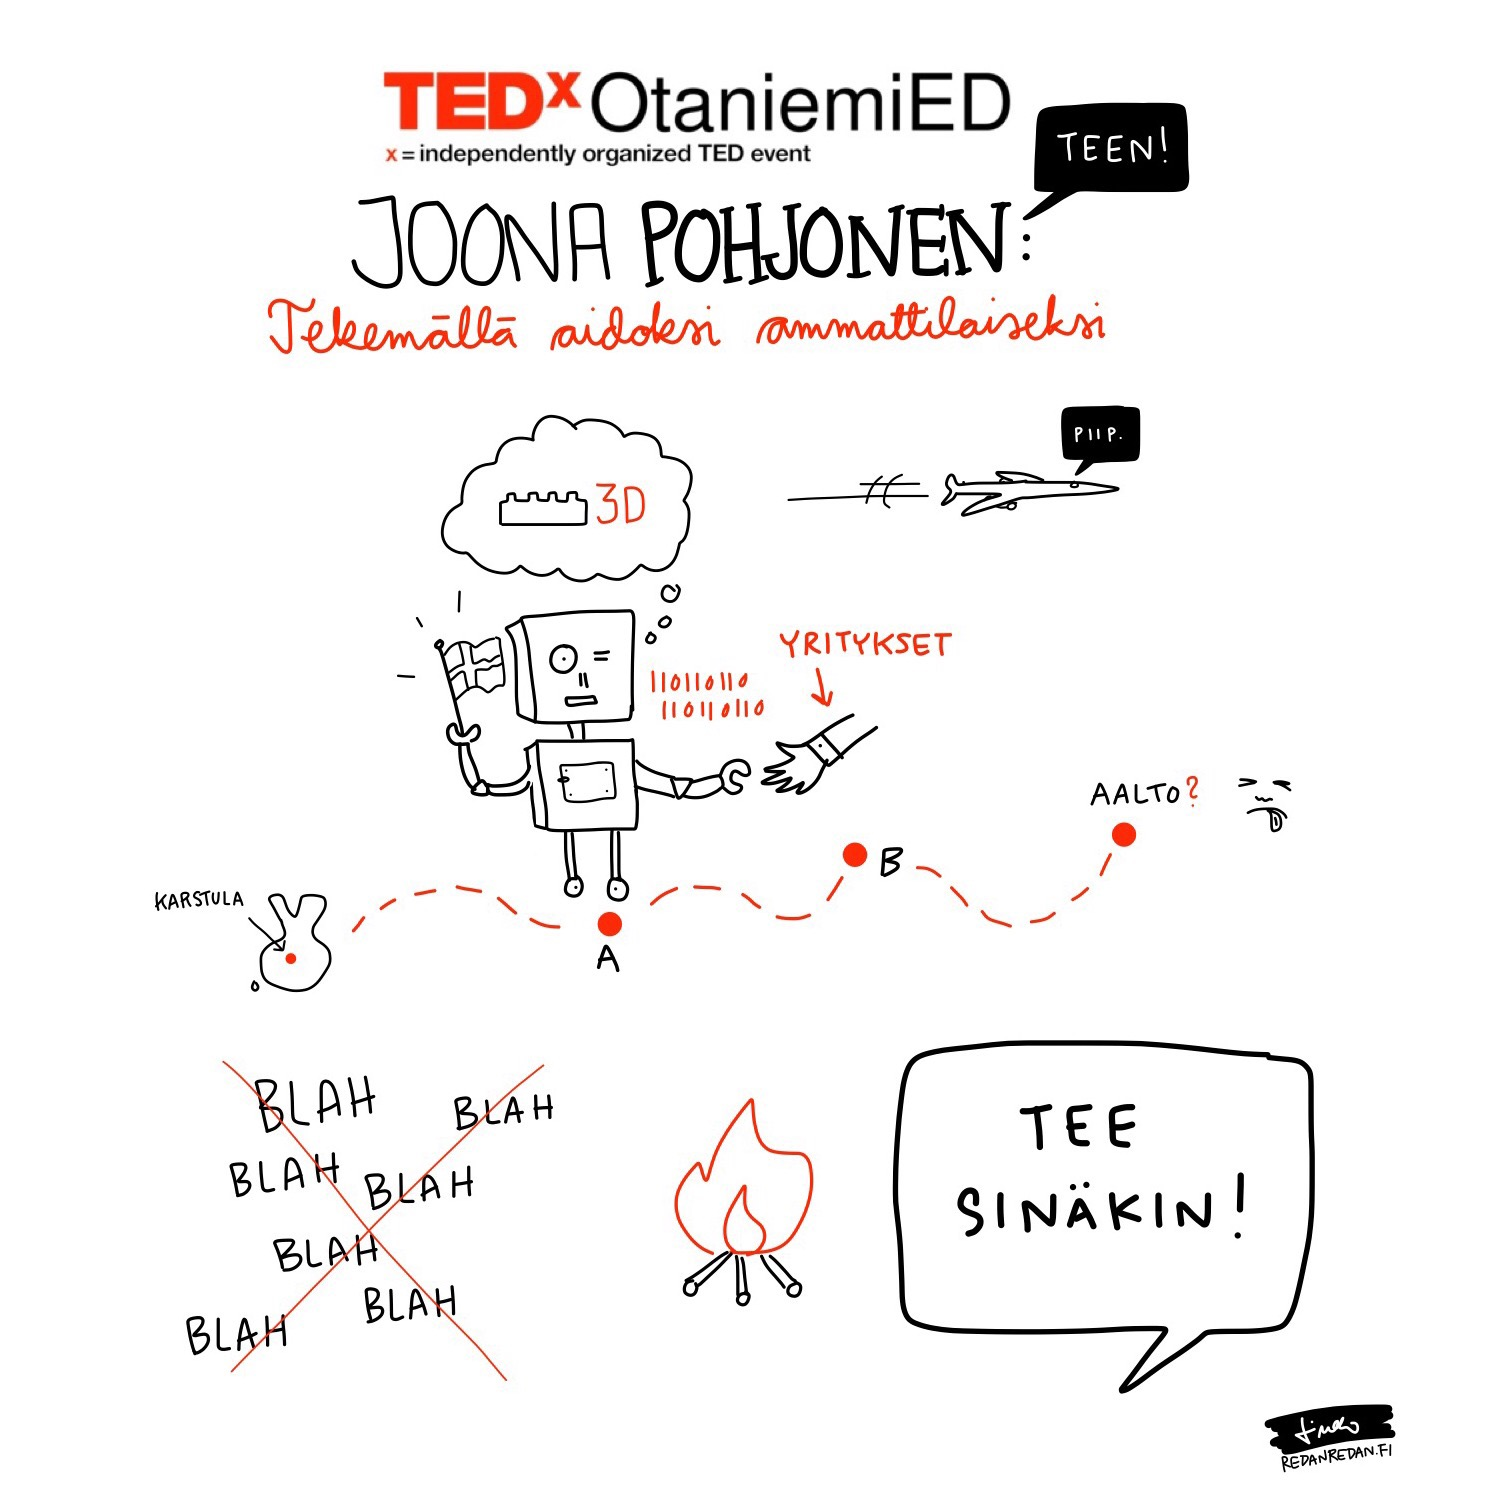 The talk is illustrated with Sketchnotes by Linda Saukko-Rauta at www.redanredan.fi